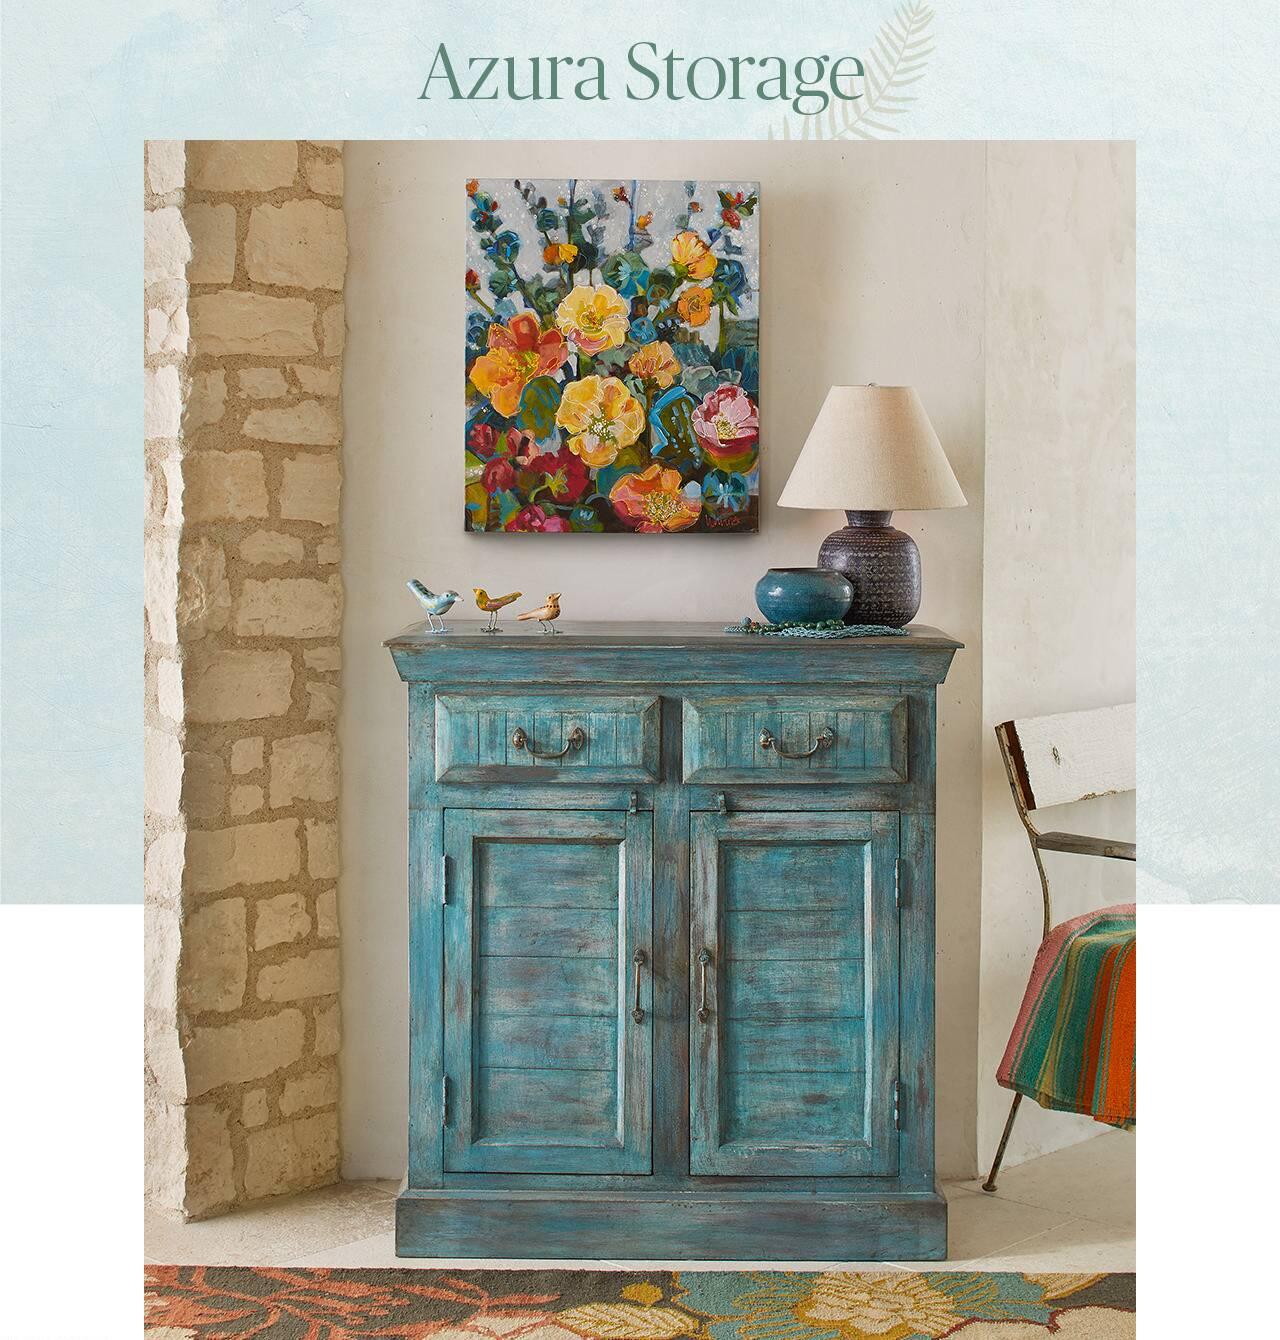 Azura Storage